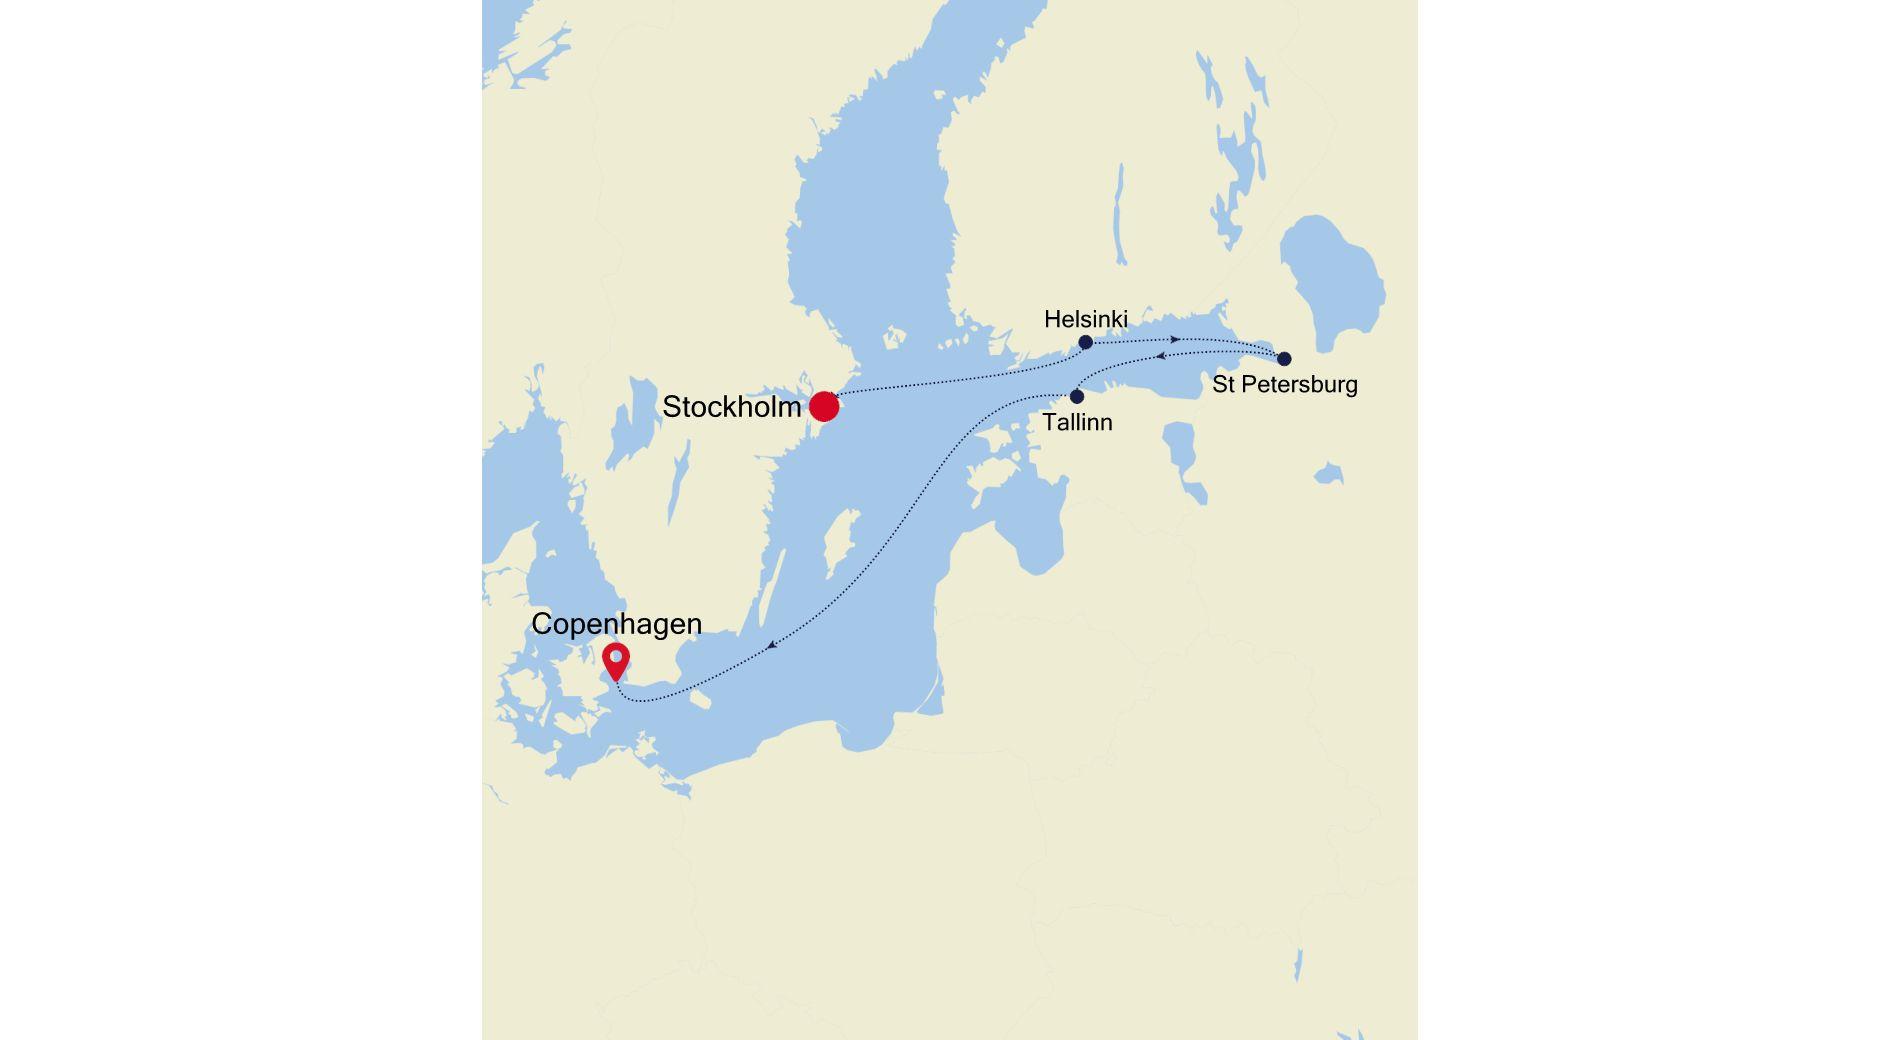 SL200827007 - Stockholm a Copenhagen